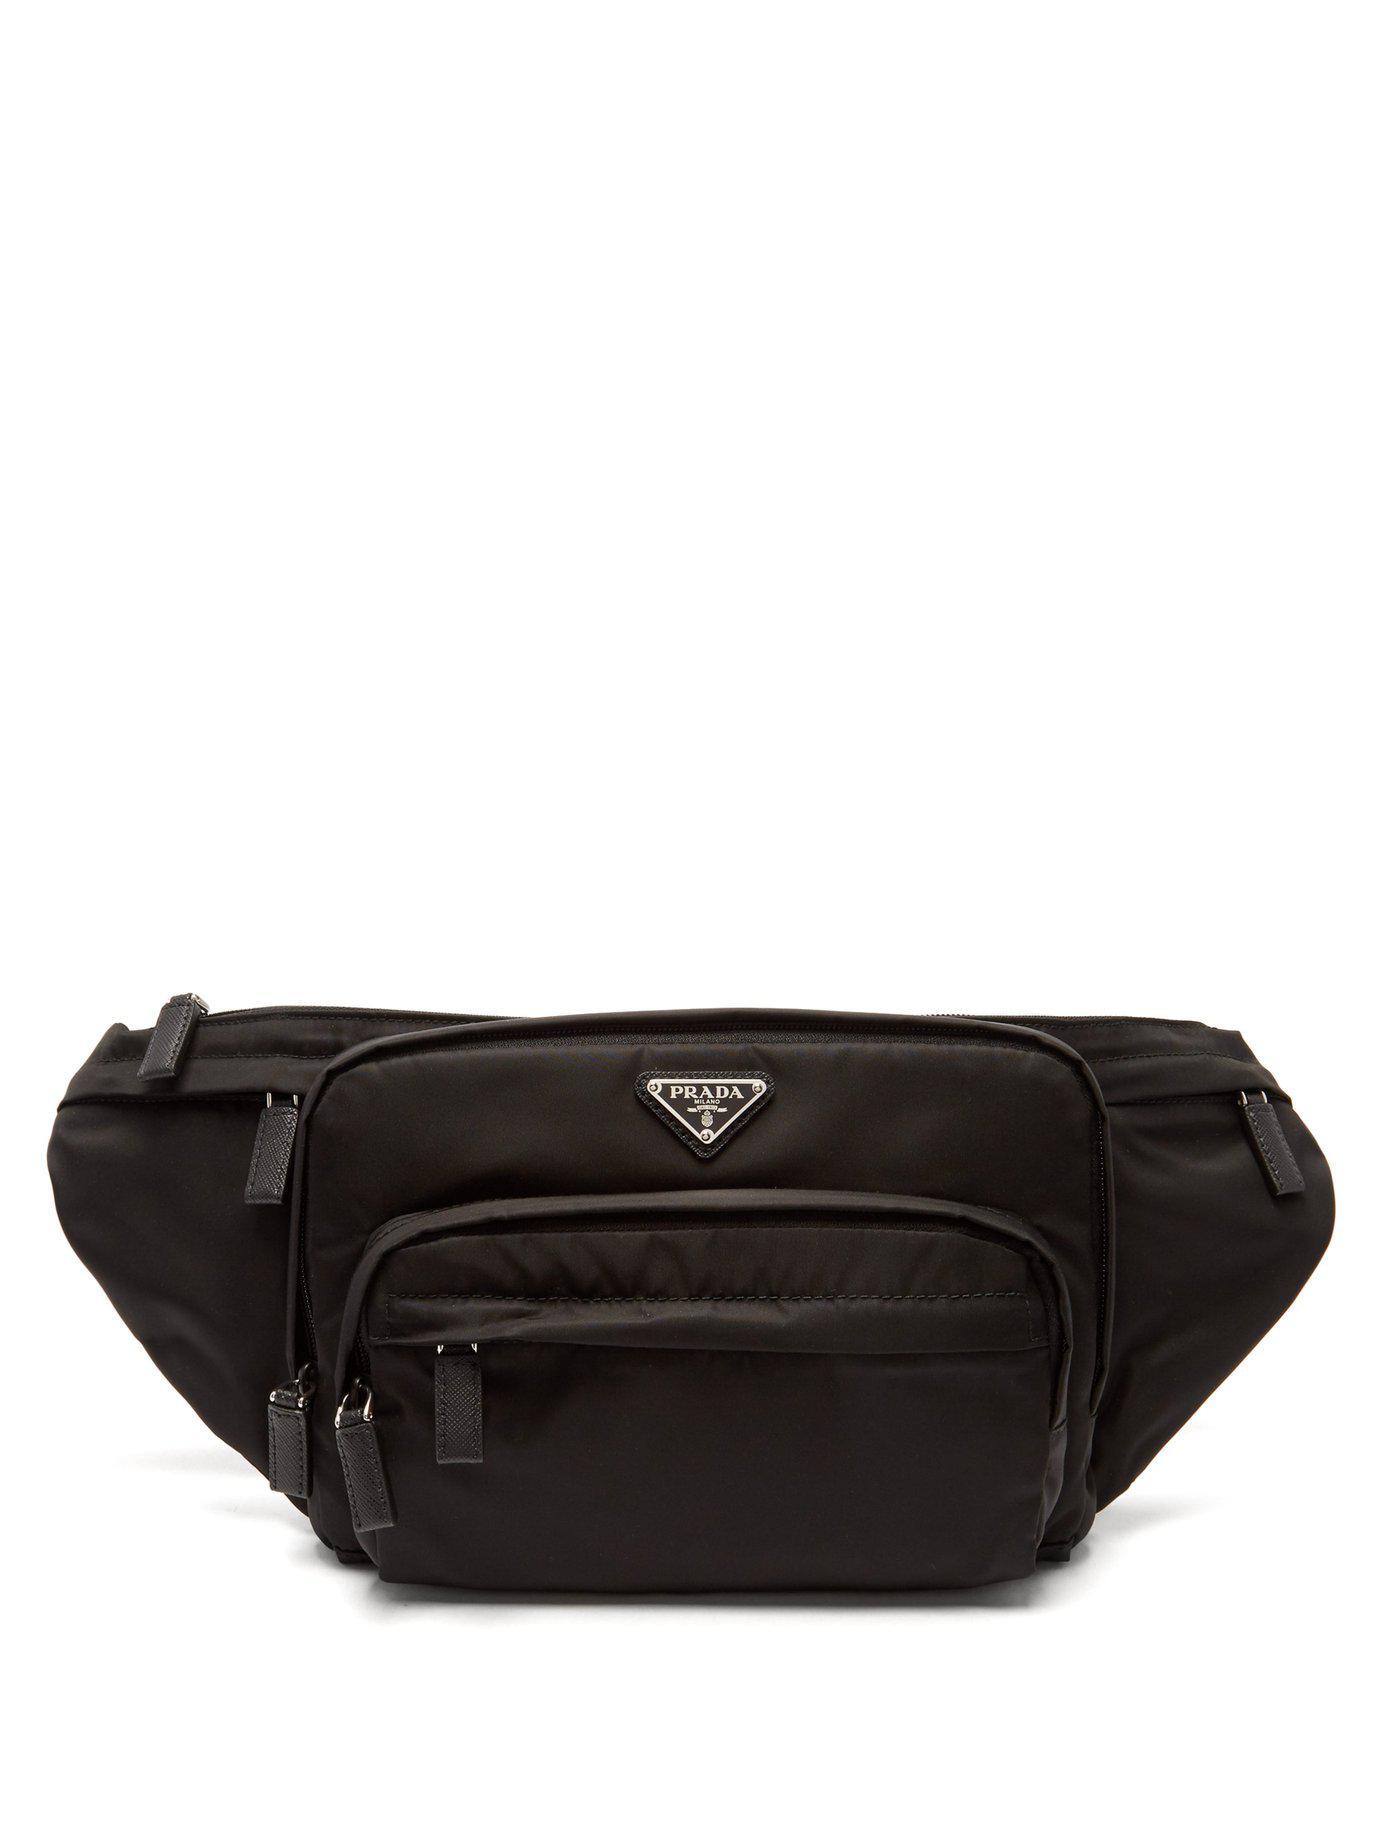 Prada - Black Logo Plaque Nylon Belt Bag for Men - Lyst. View fullscreen 92ac8165ccb3e